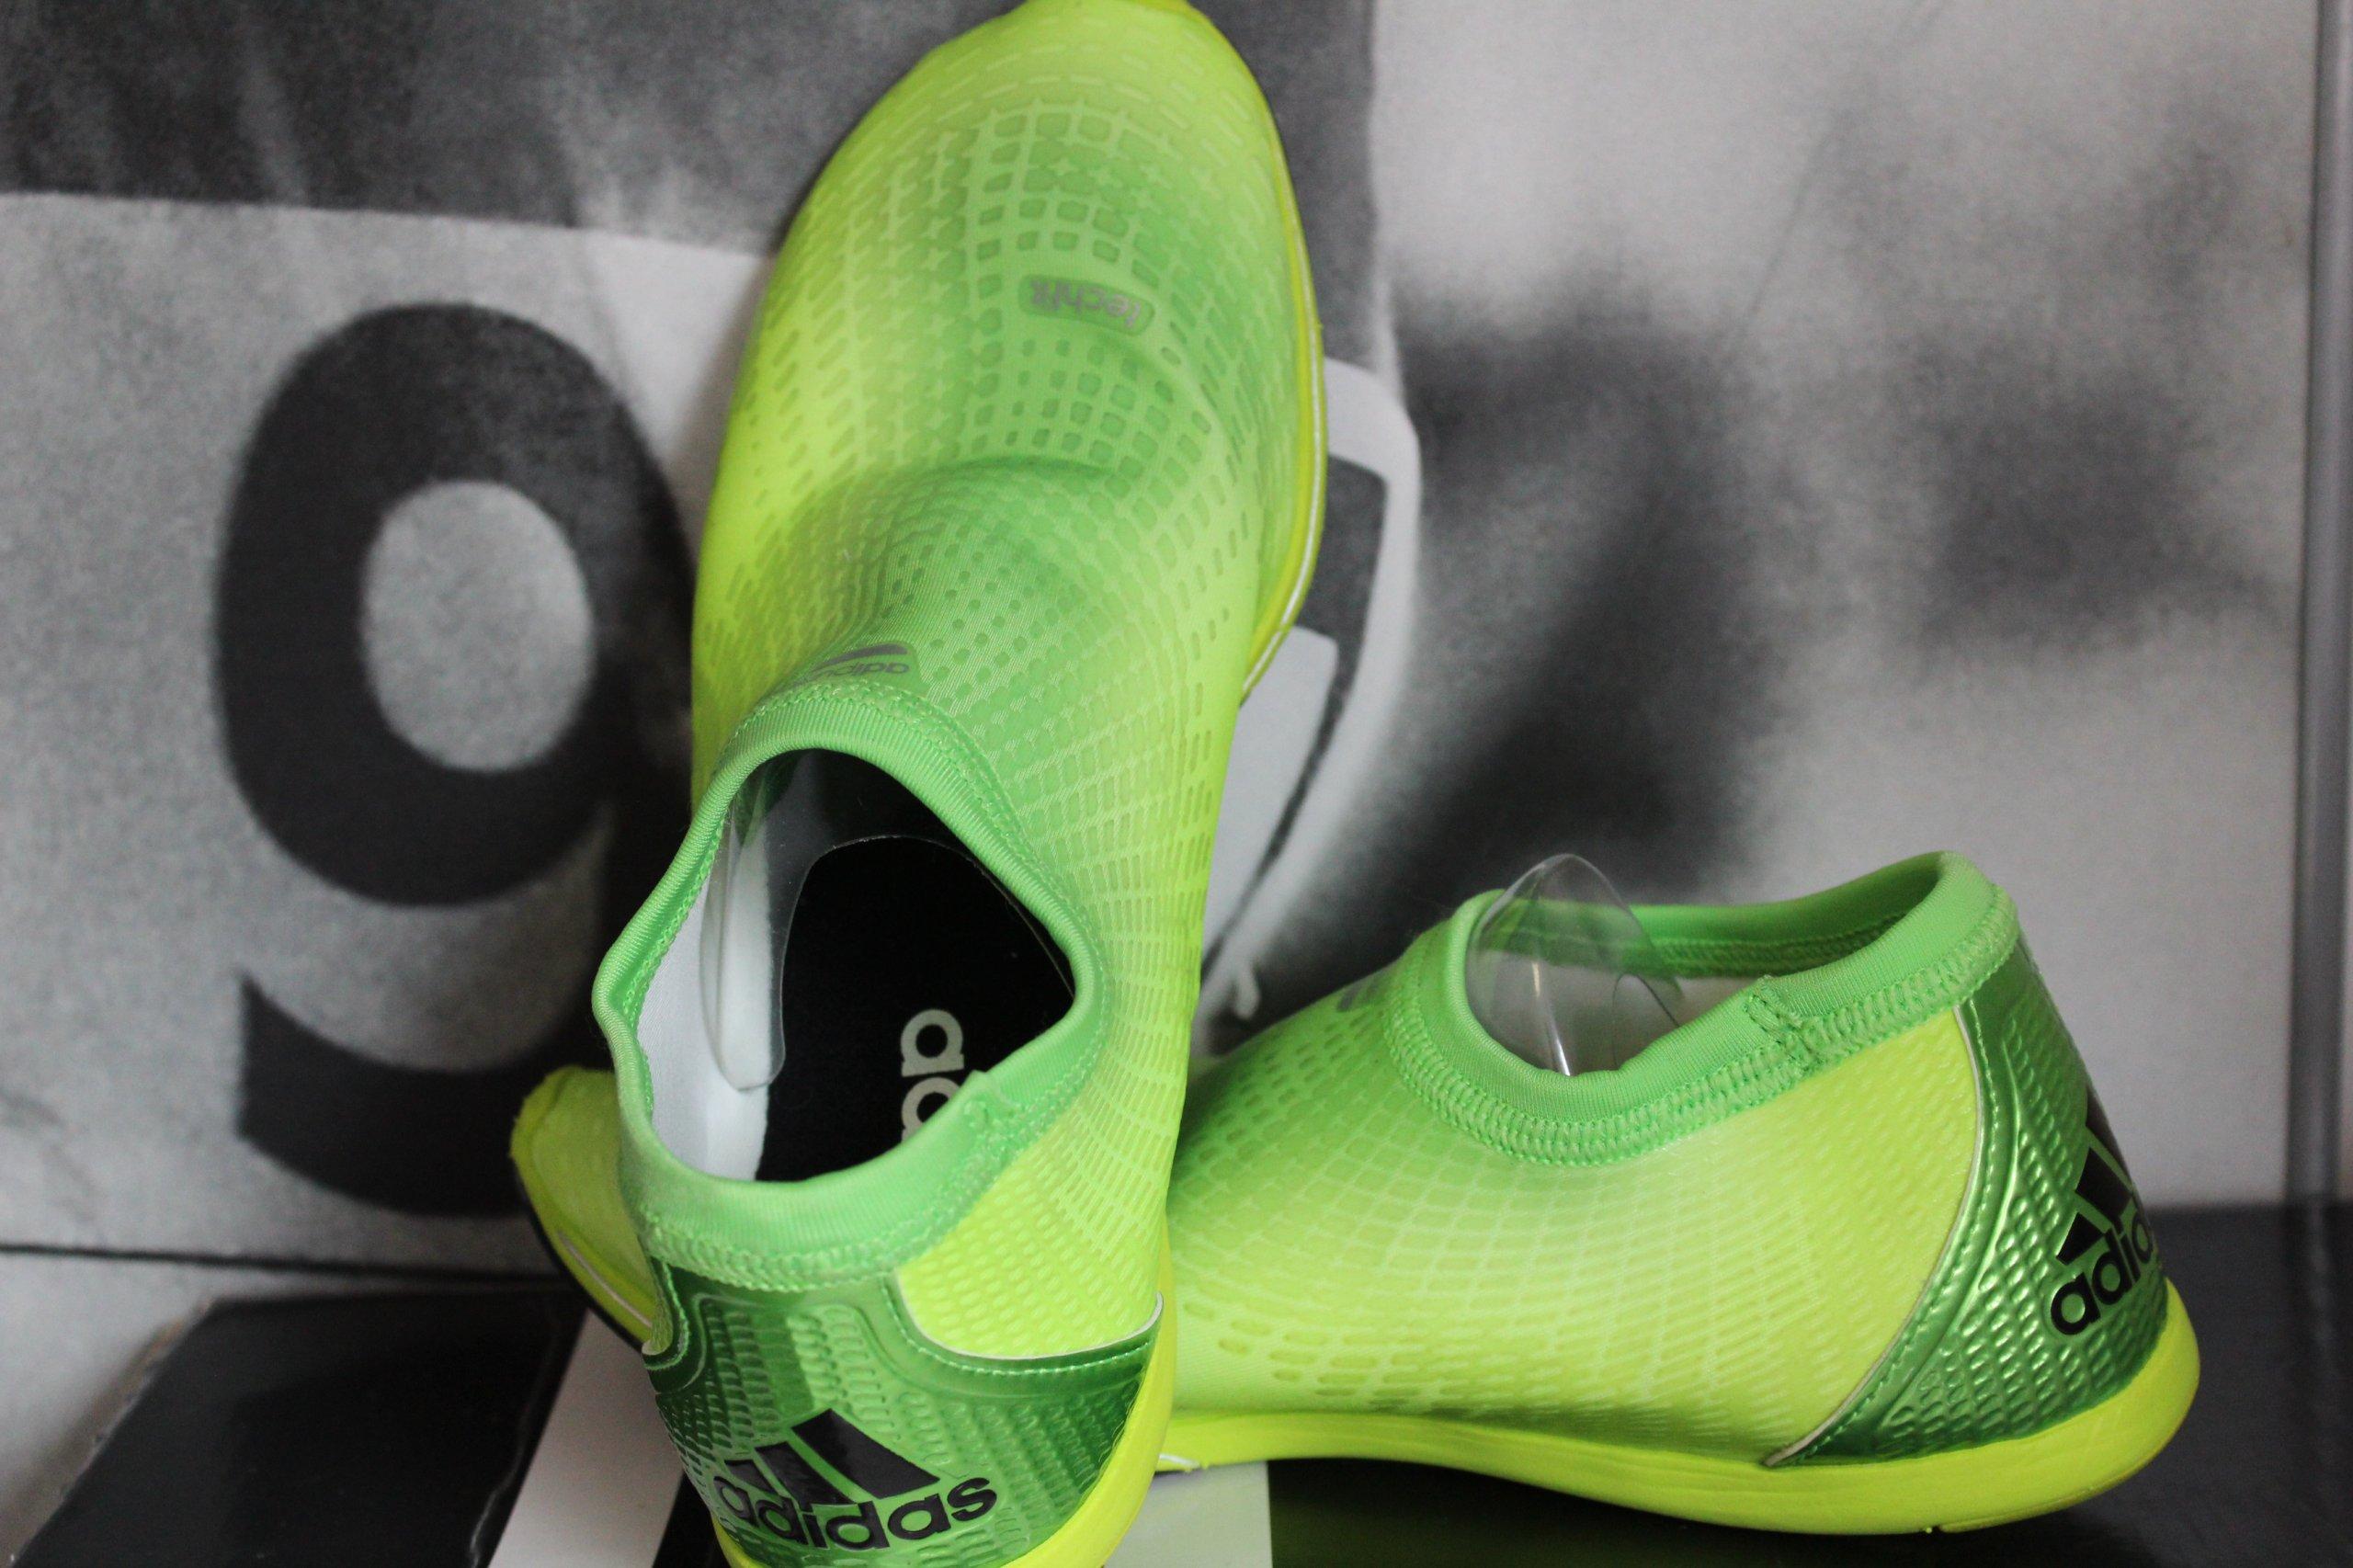 low priced 7f003 6b47b BUTY do biegania Adidas ADIPURE ADAPT 2 M (7321820309)